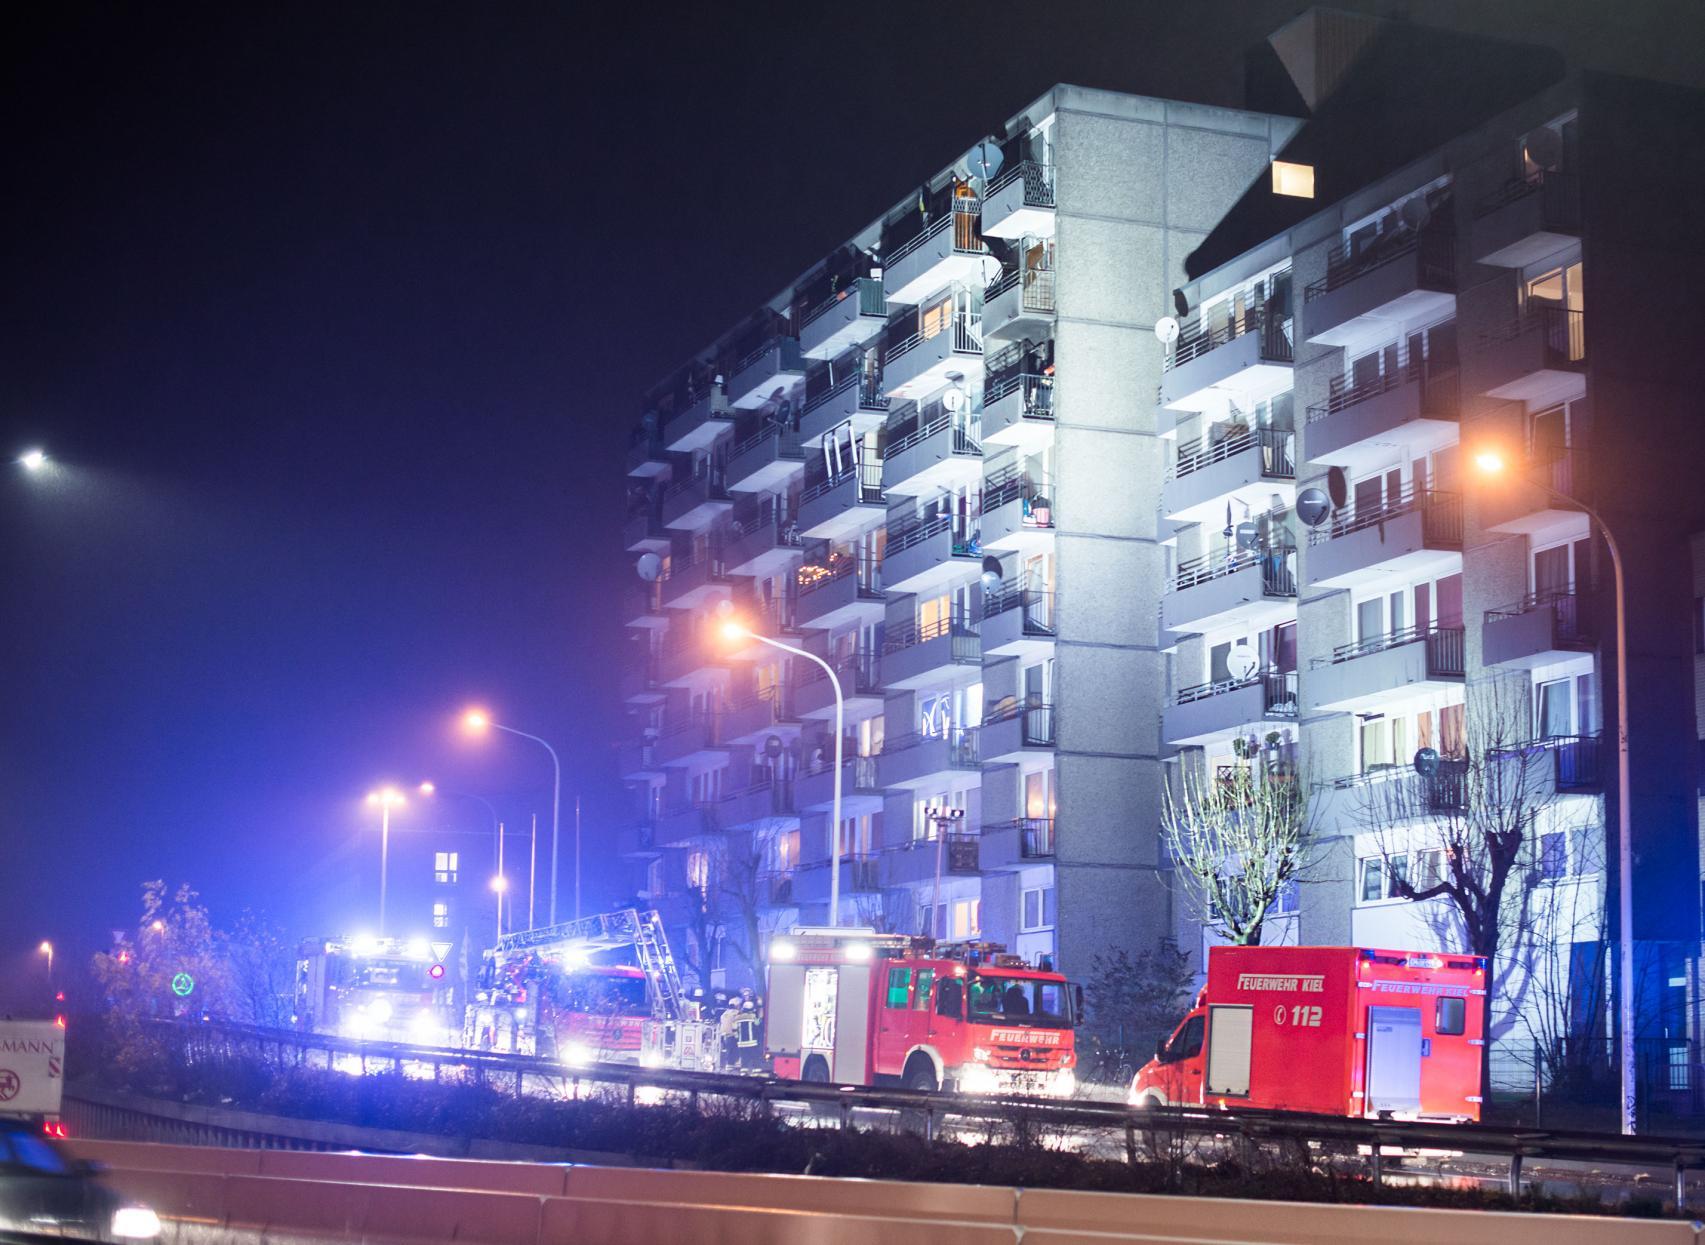 Feuer auf Balkon Kiel Bullenkloster